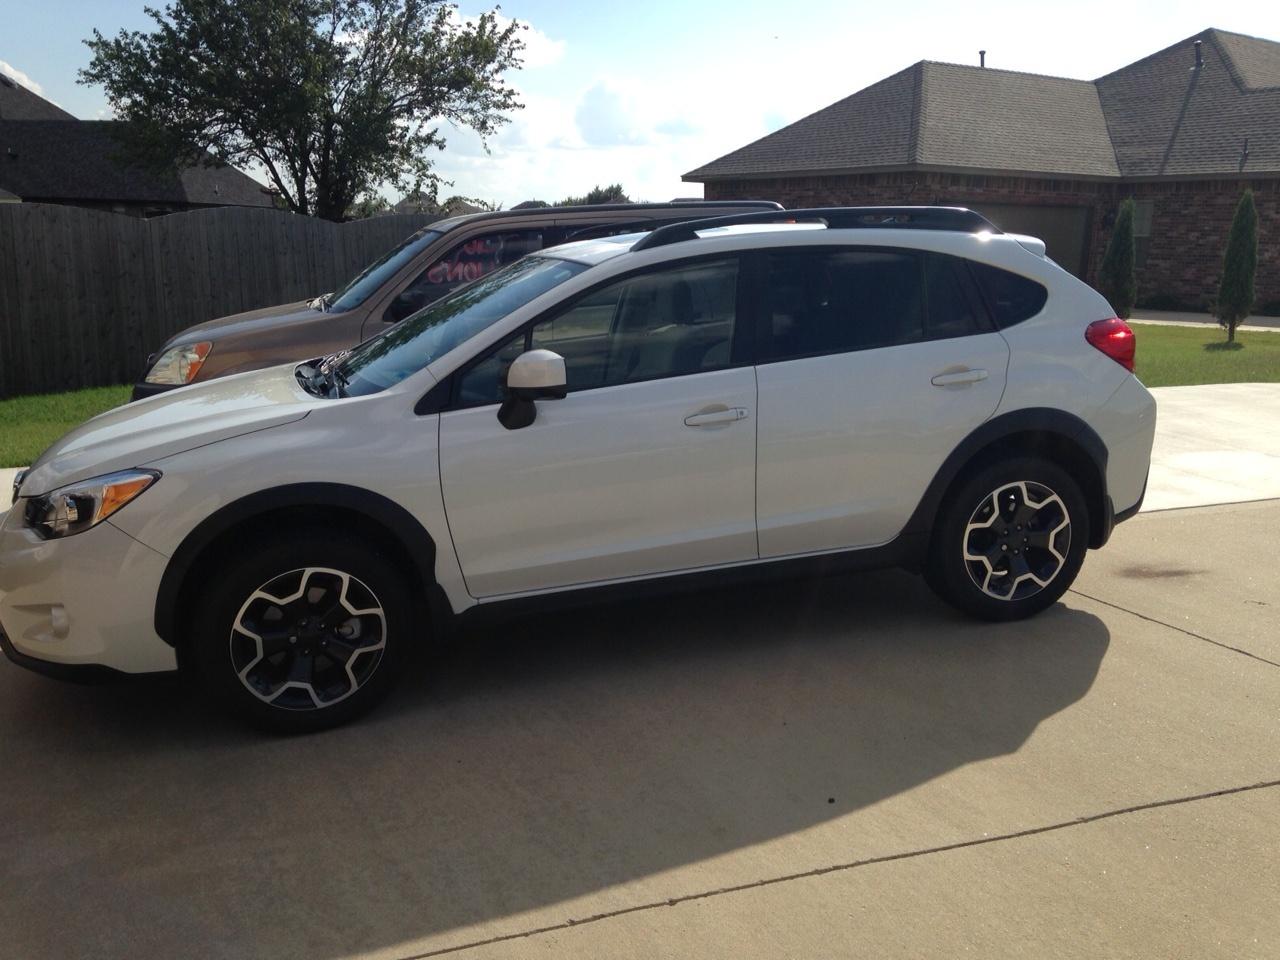 New 2015 Subaru XV Crosstrek For Sale - CarGurus